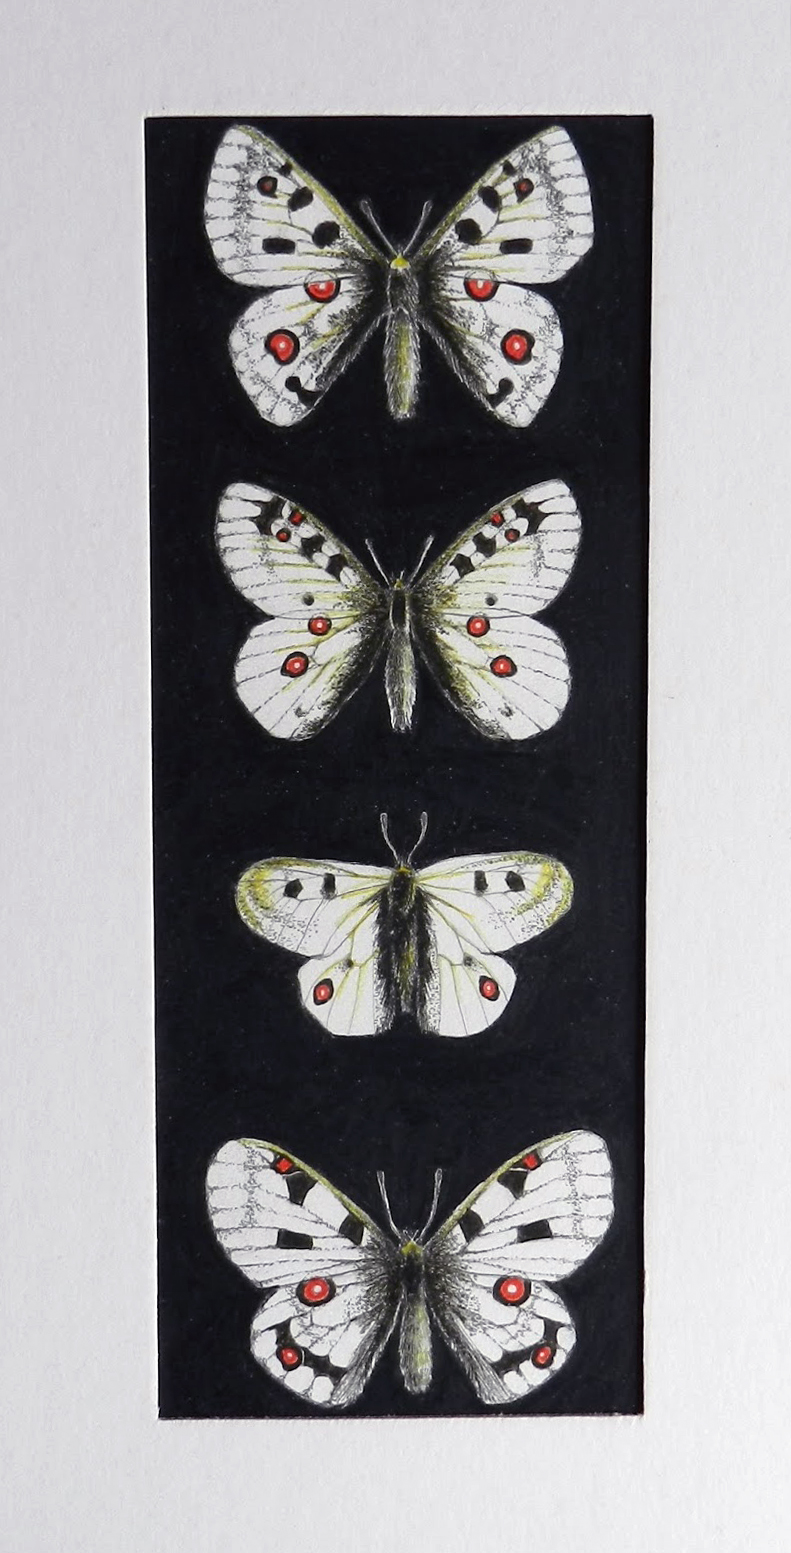 4 borboletas brancas pintadas